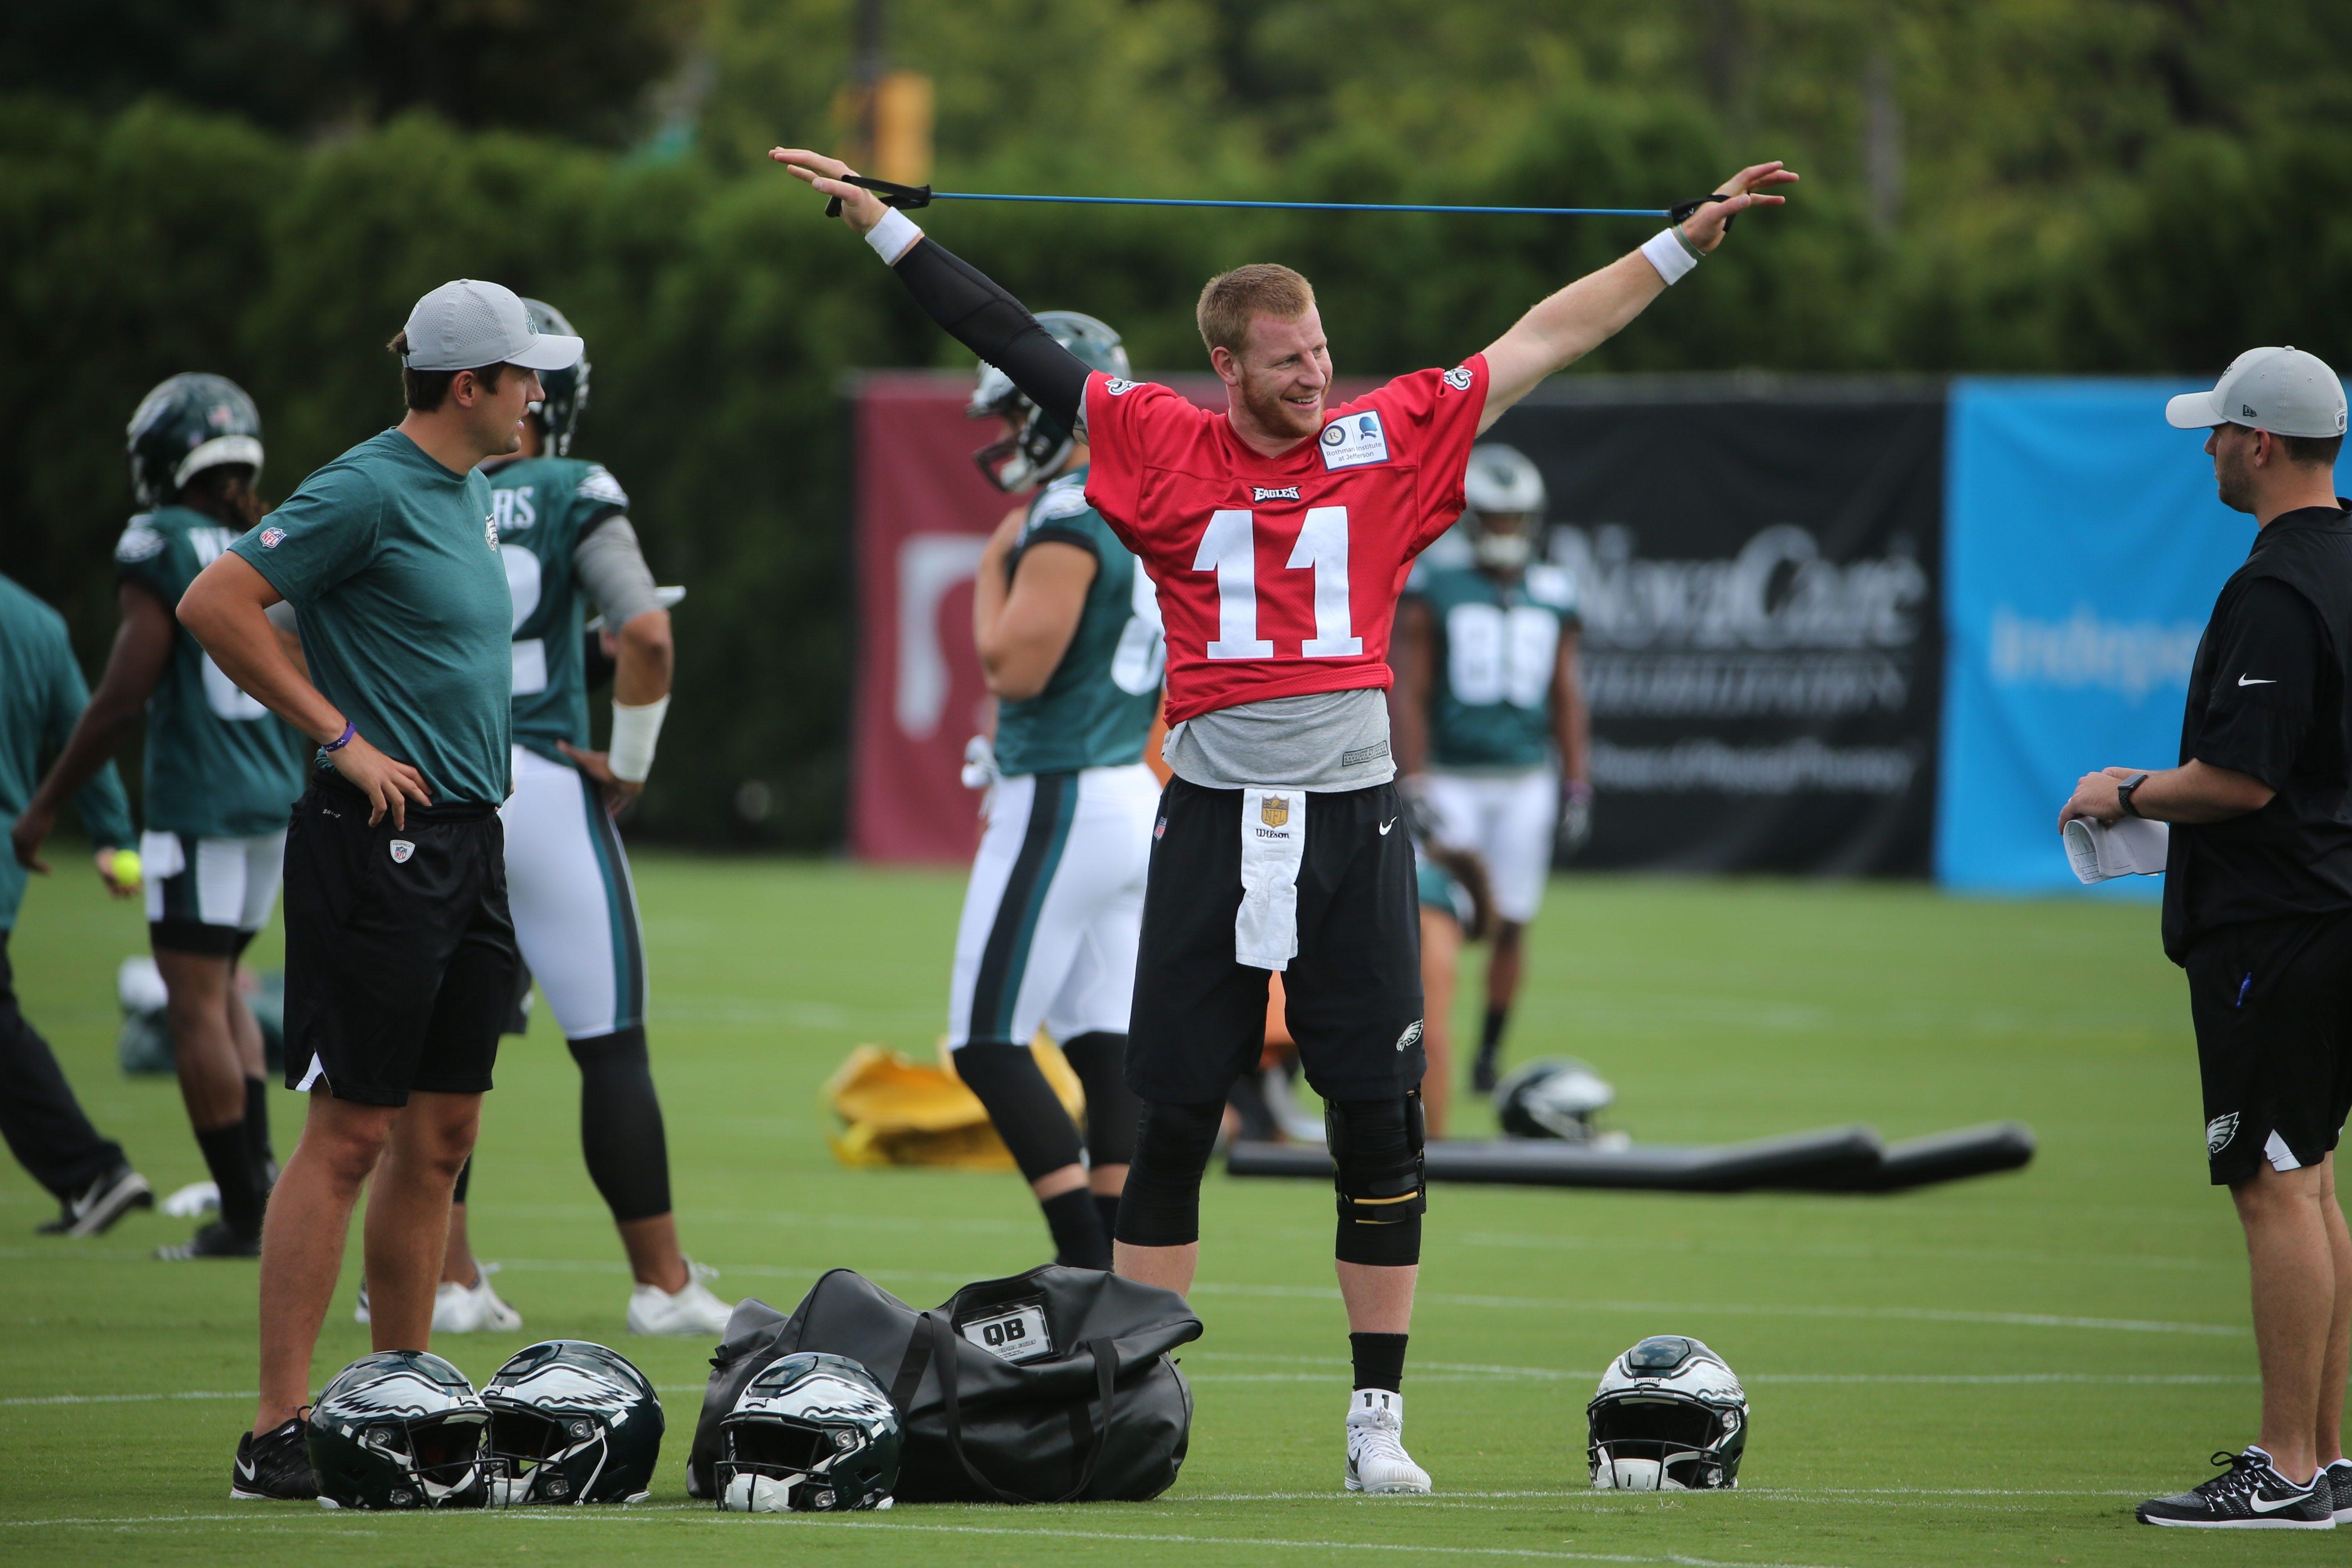 78740e0ee68 Philadelphia Eagles training camp: All eyes on Carson Wentz, injured players